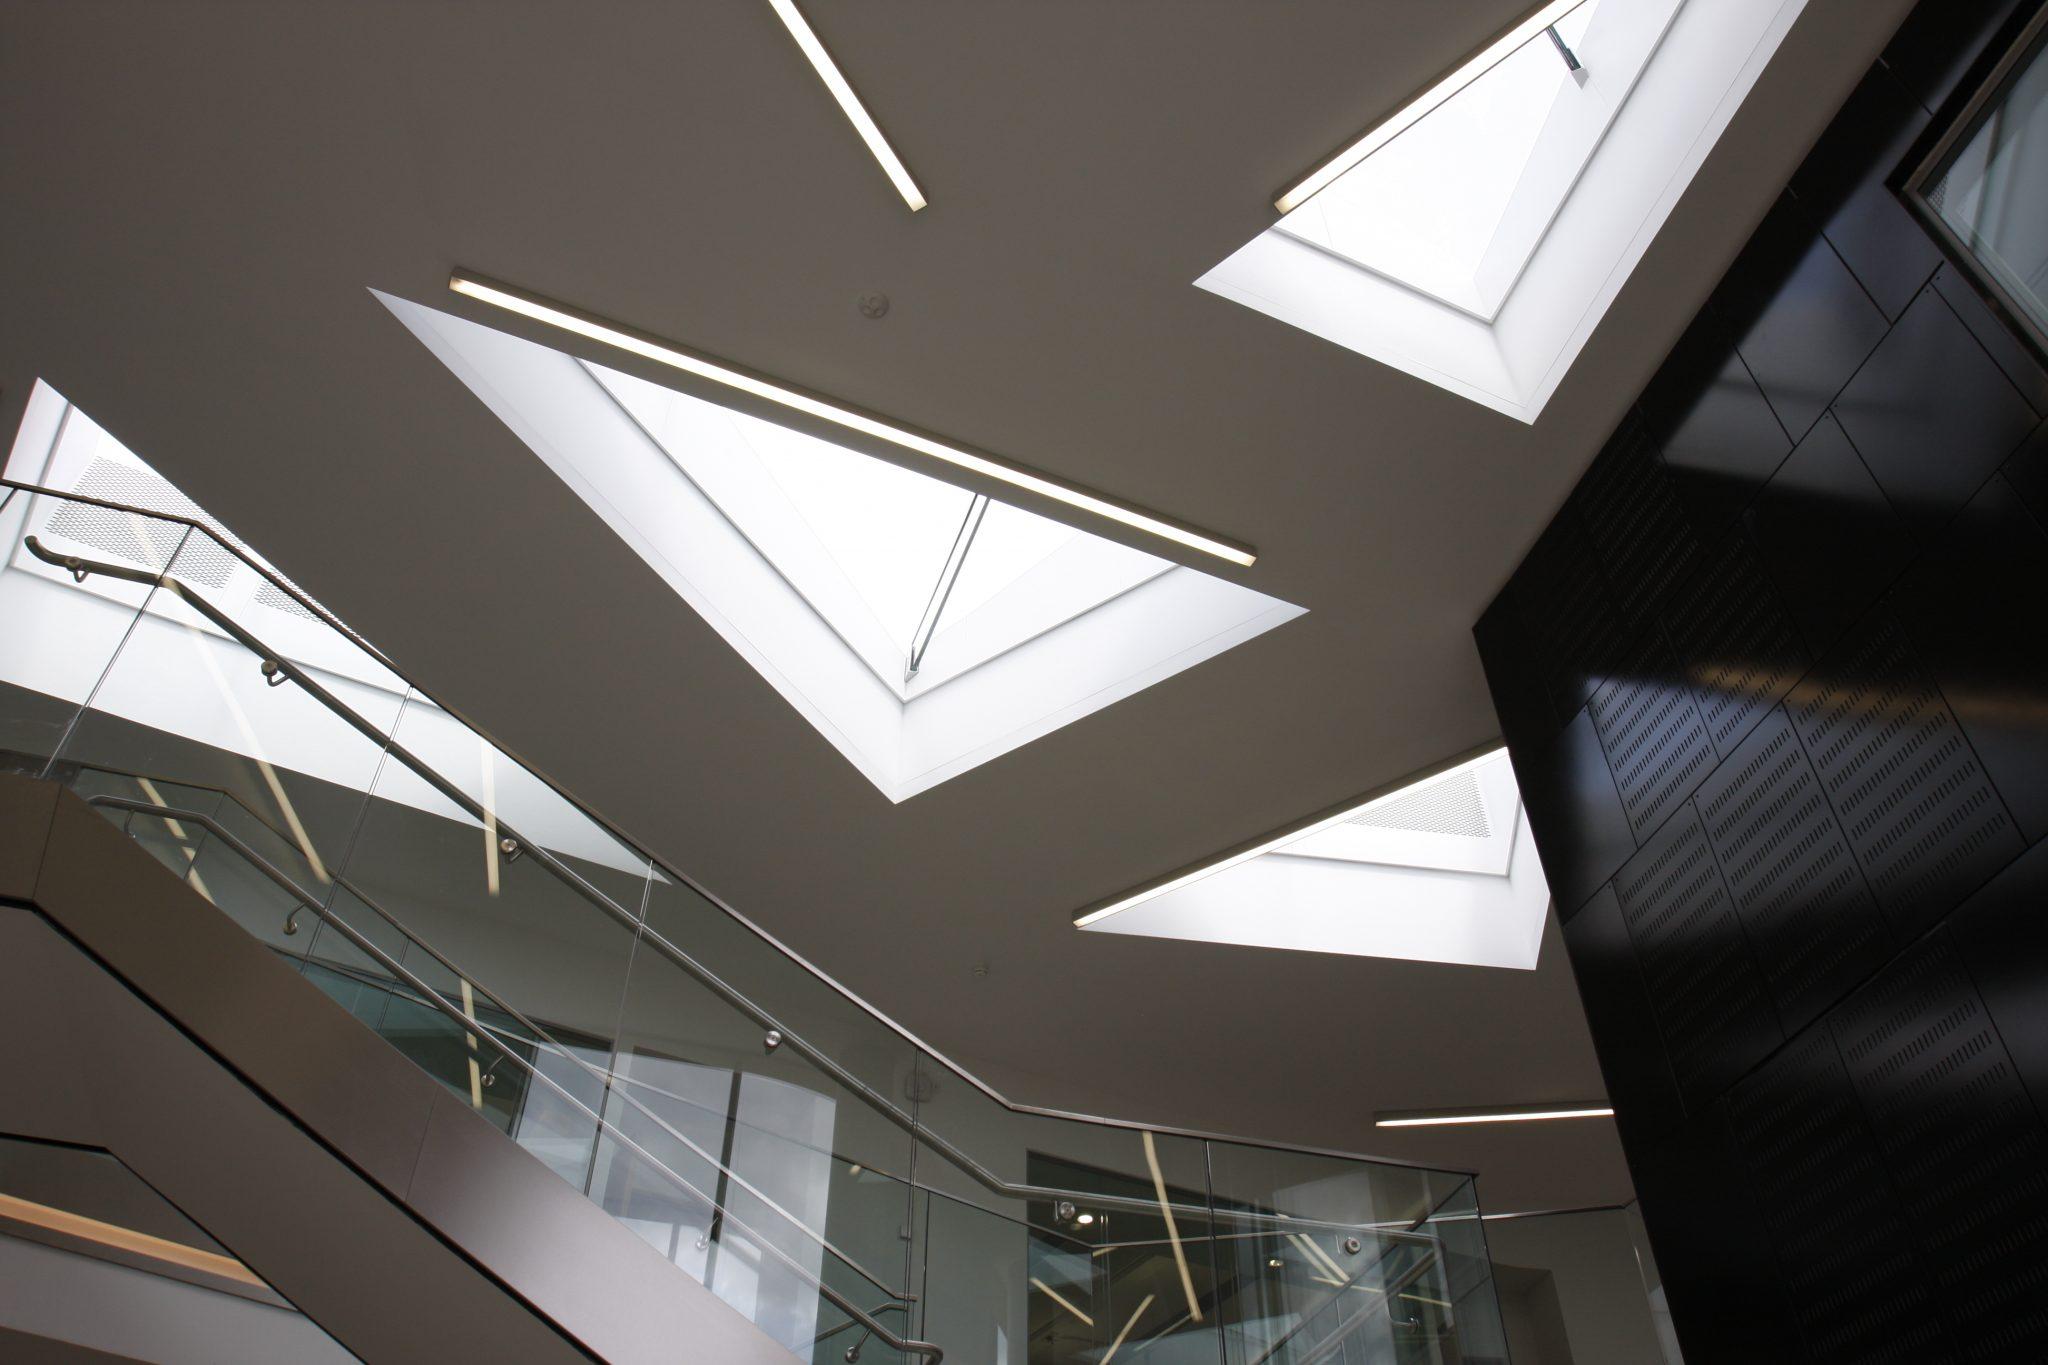 Hertfordshire University Iq Projects